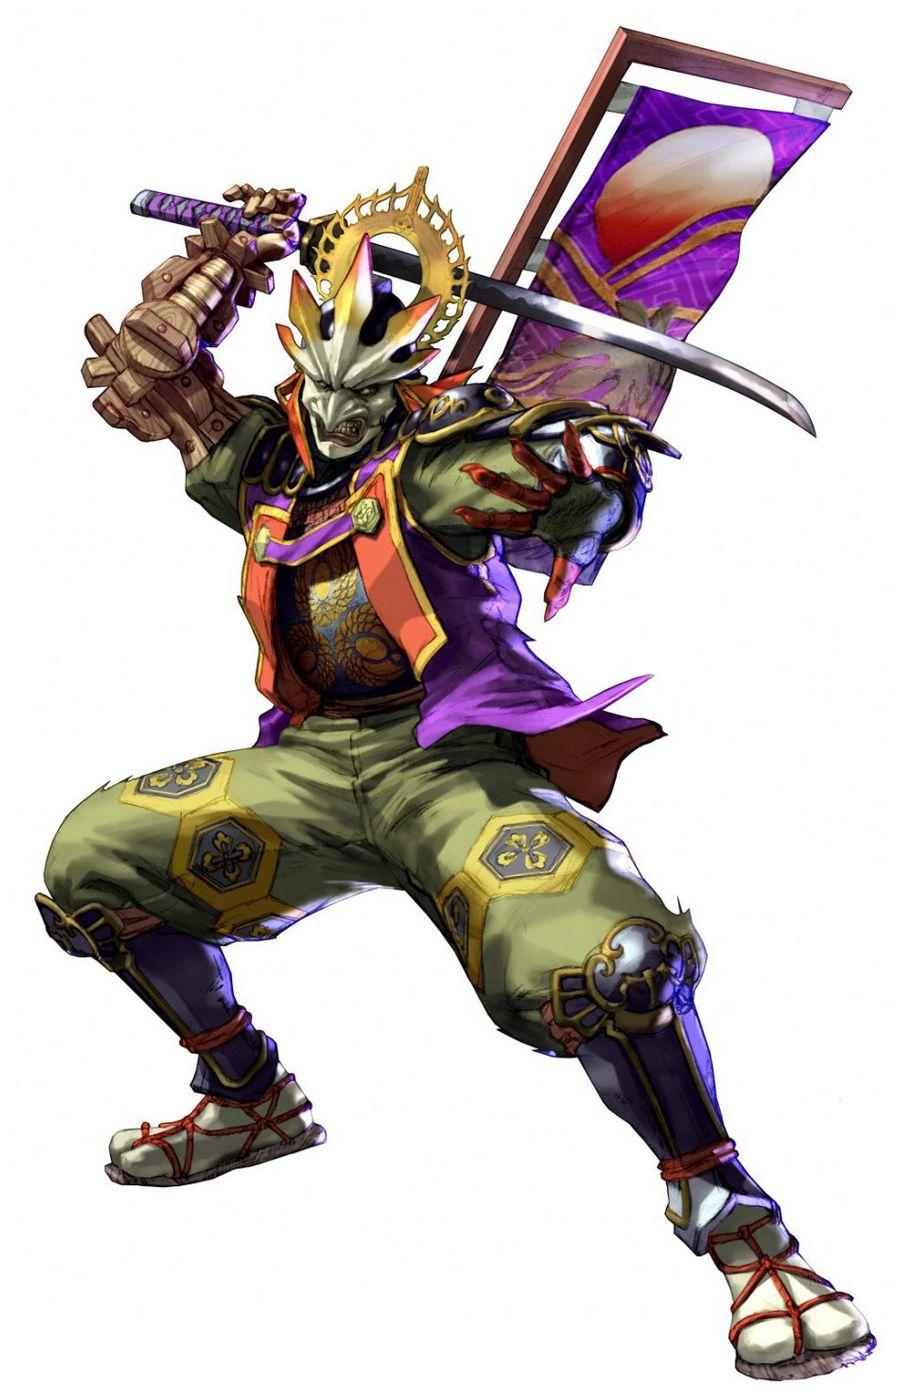 Yoshimitsu Character Design : Yoshimitsu soul calibur pinterest samurai male